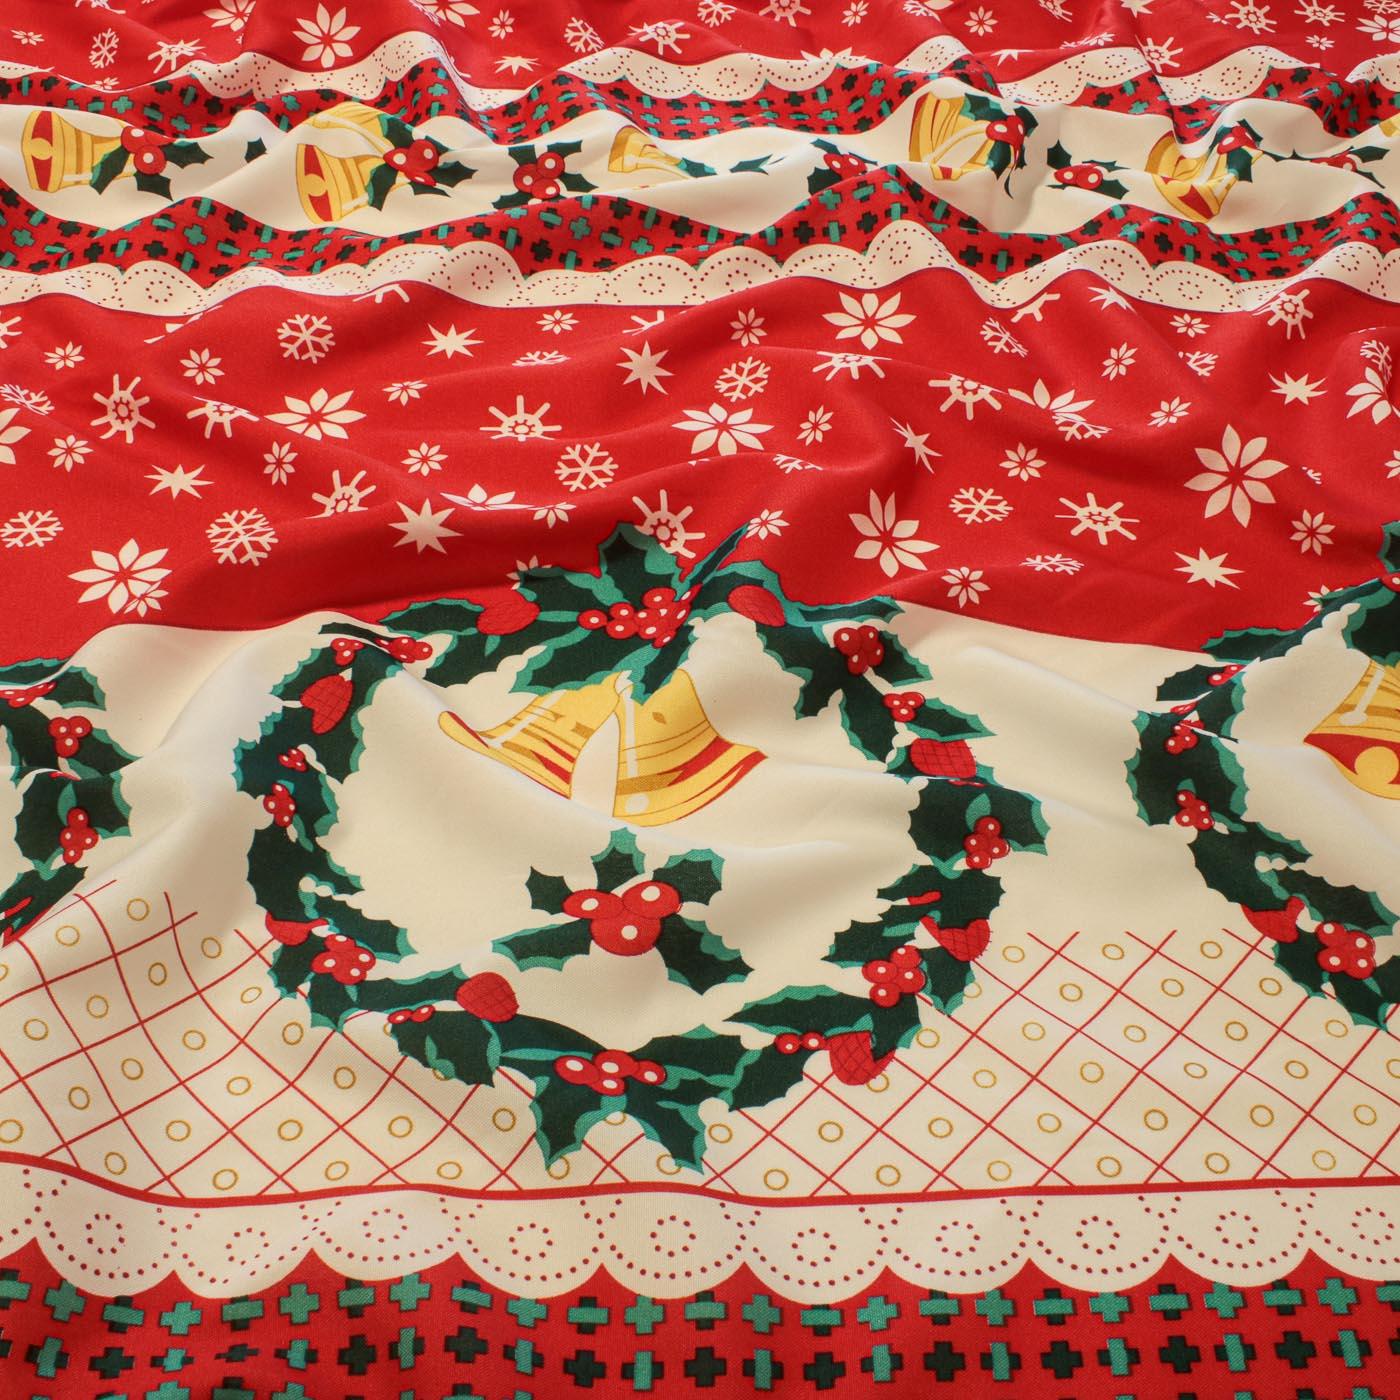 Tecido Oxford Estampado Natalino Natal Sinos Coroa Vermelha